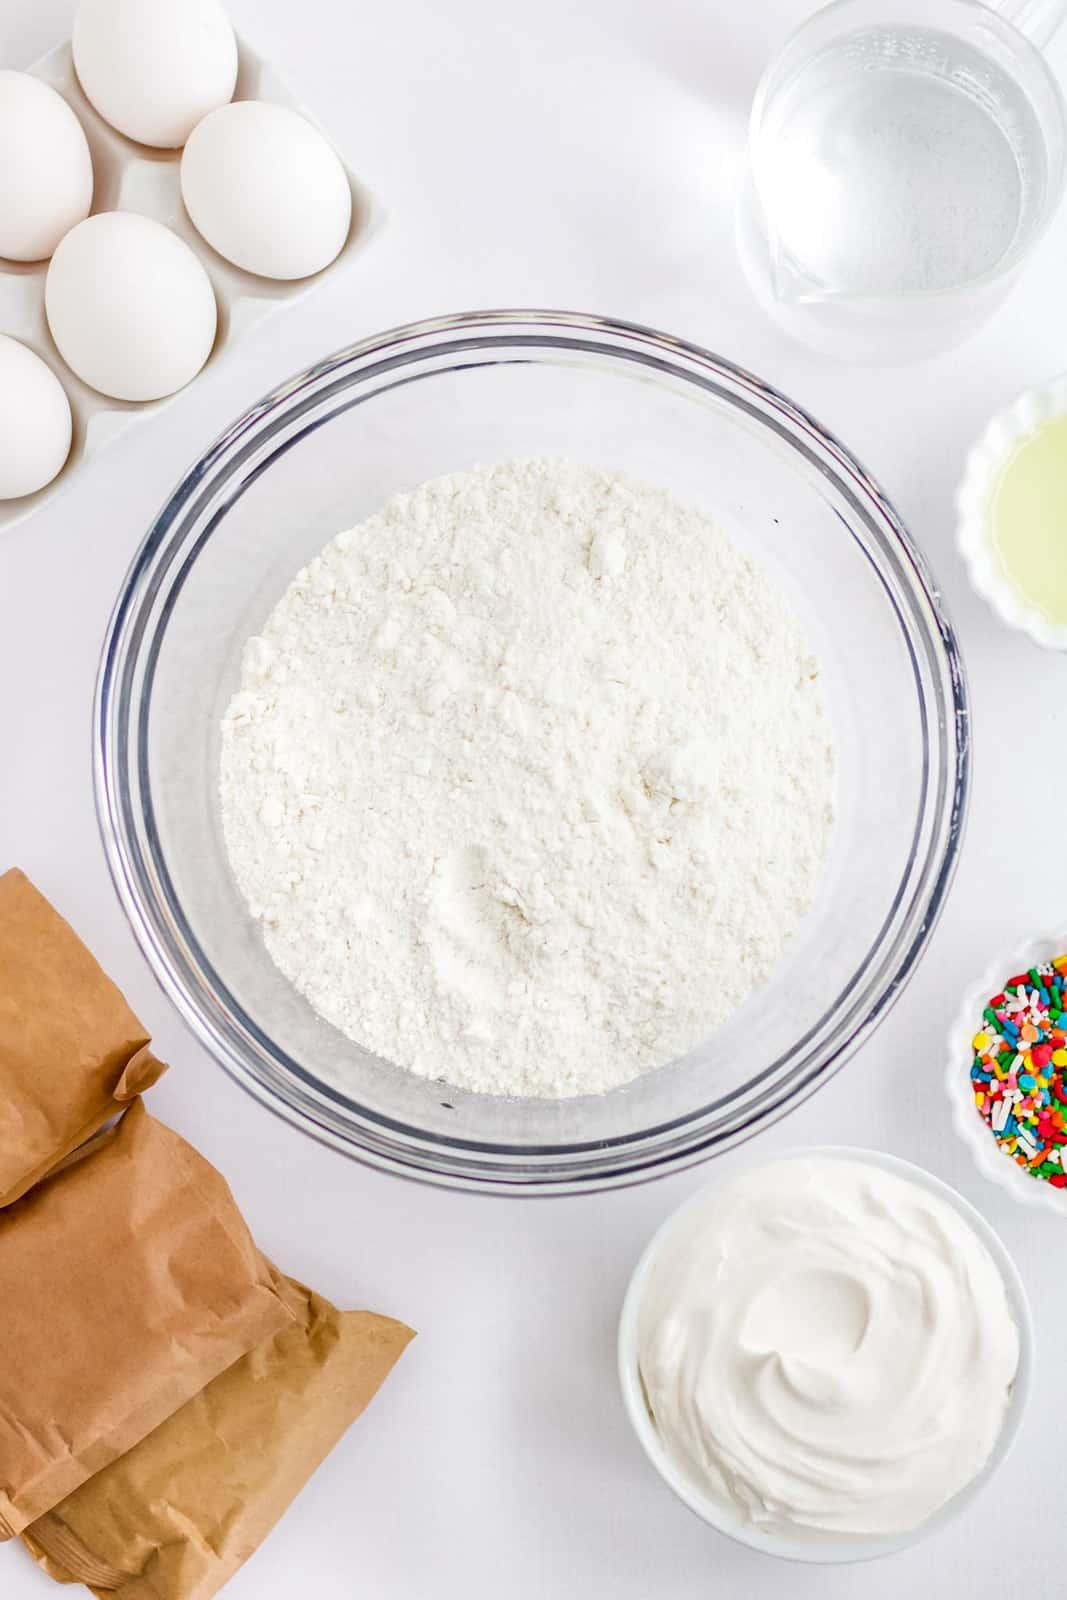 Ingredients needed to make a Rainbow Jello Poke Cake